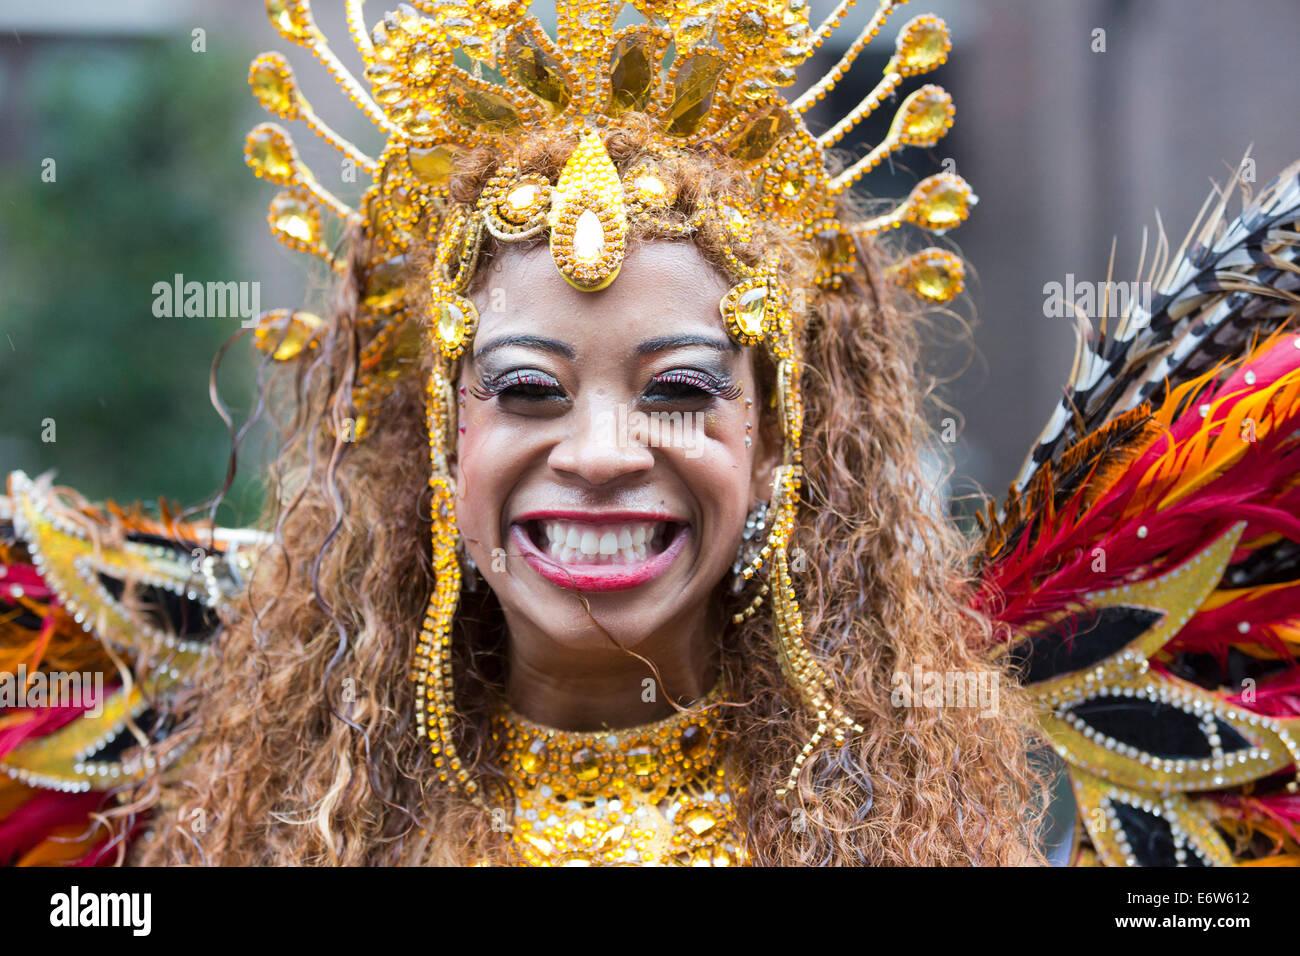 Samba Dancer from the London School of Samba at a rainy Notting Hill Carnival parade, London, UK - Stock Image